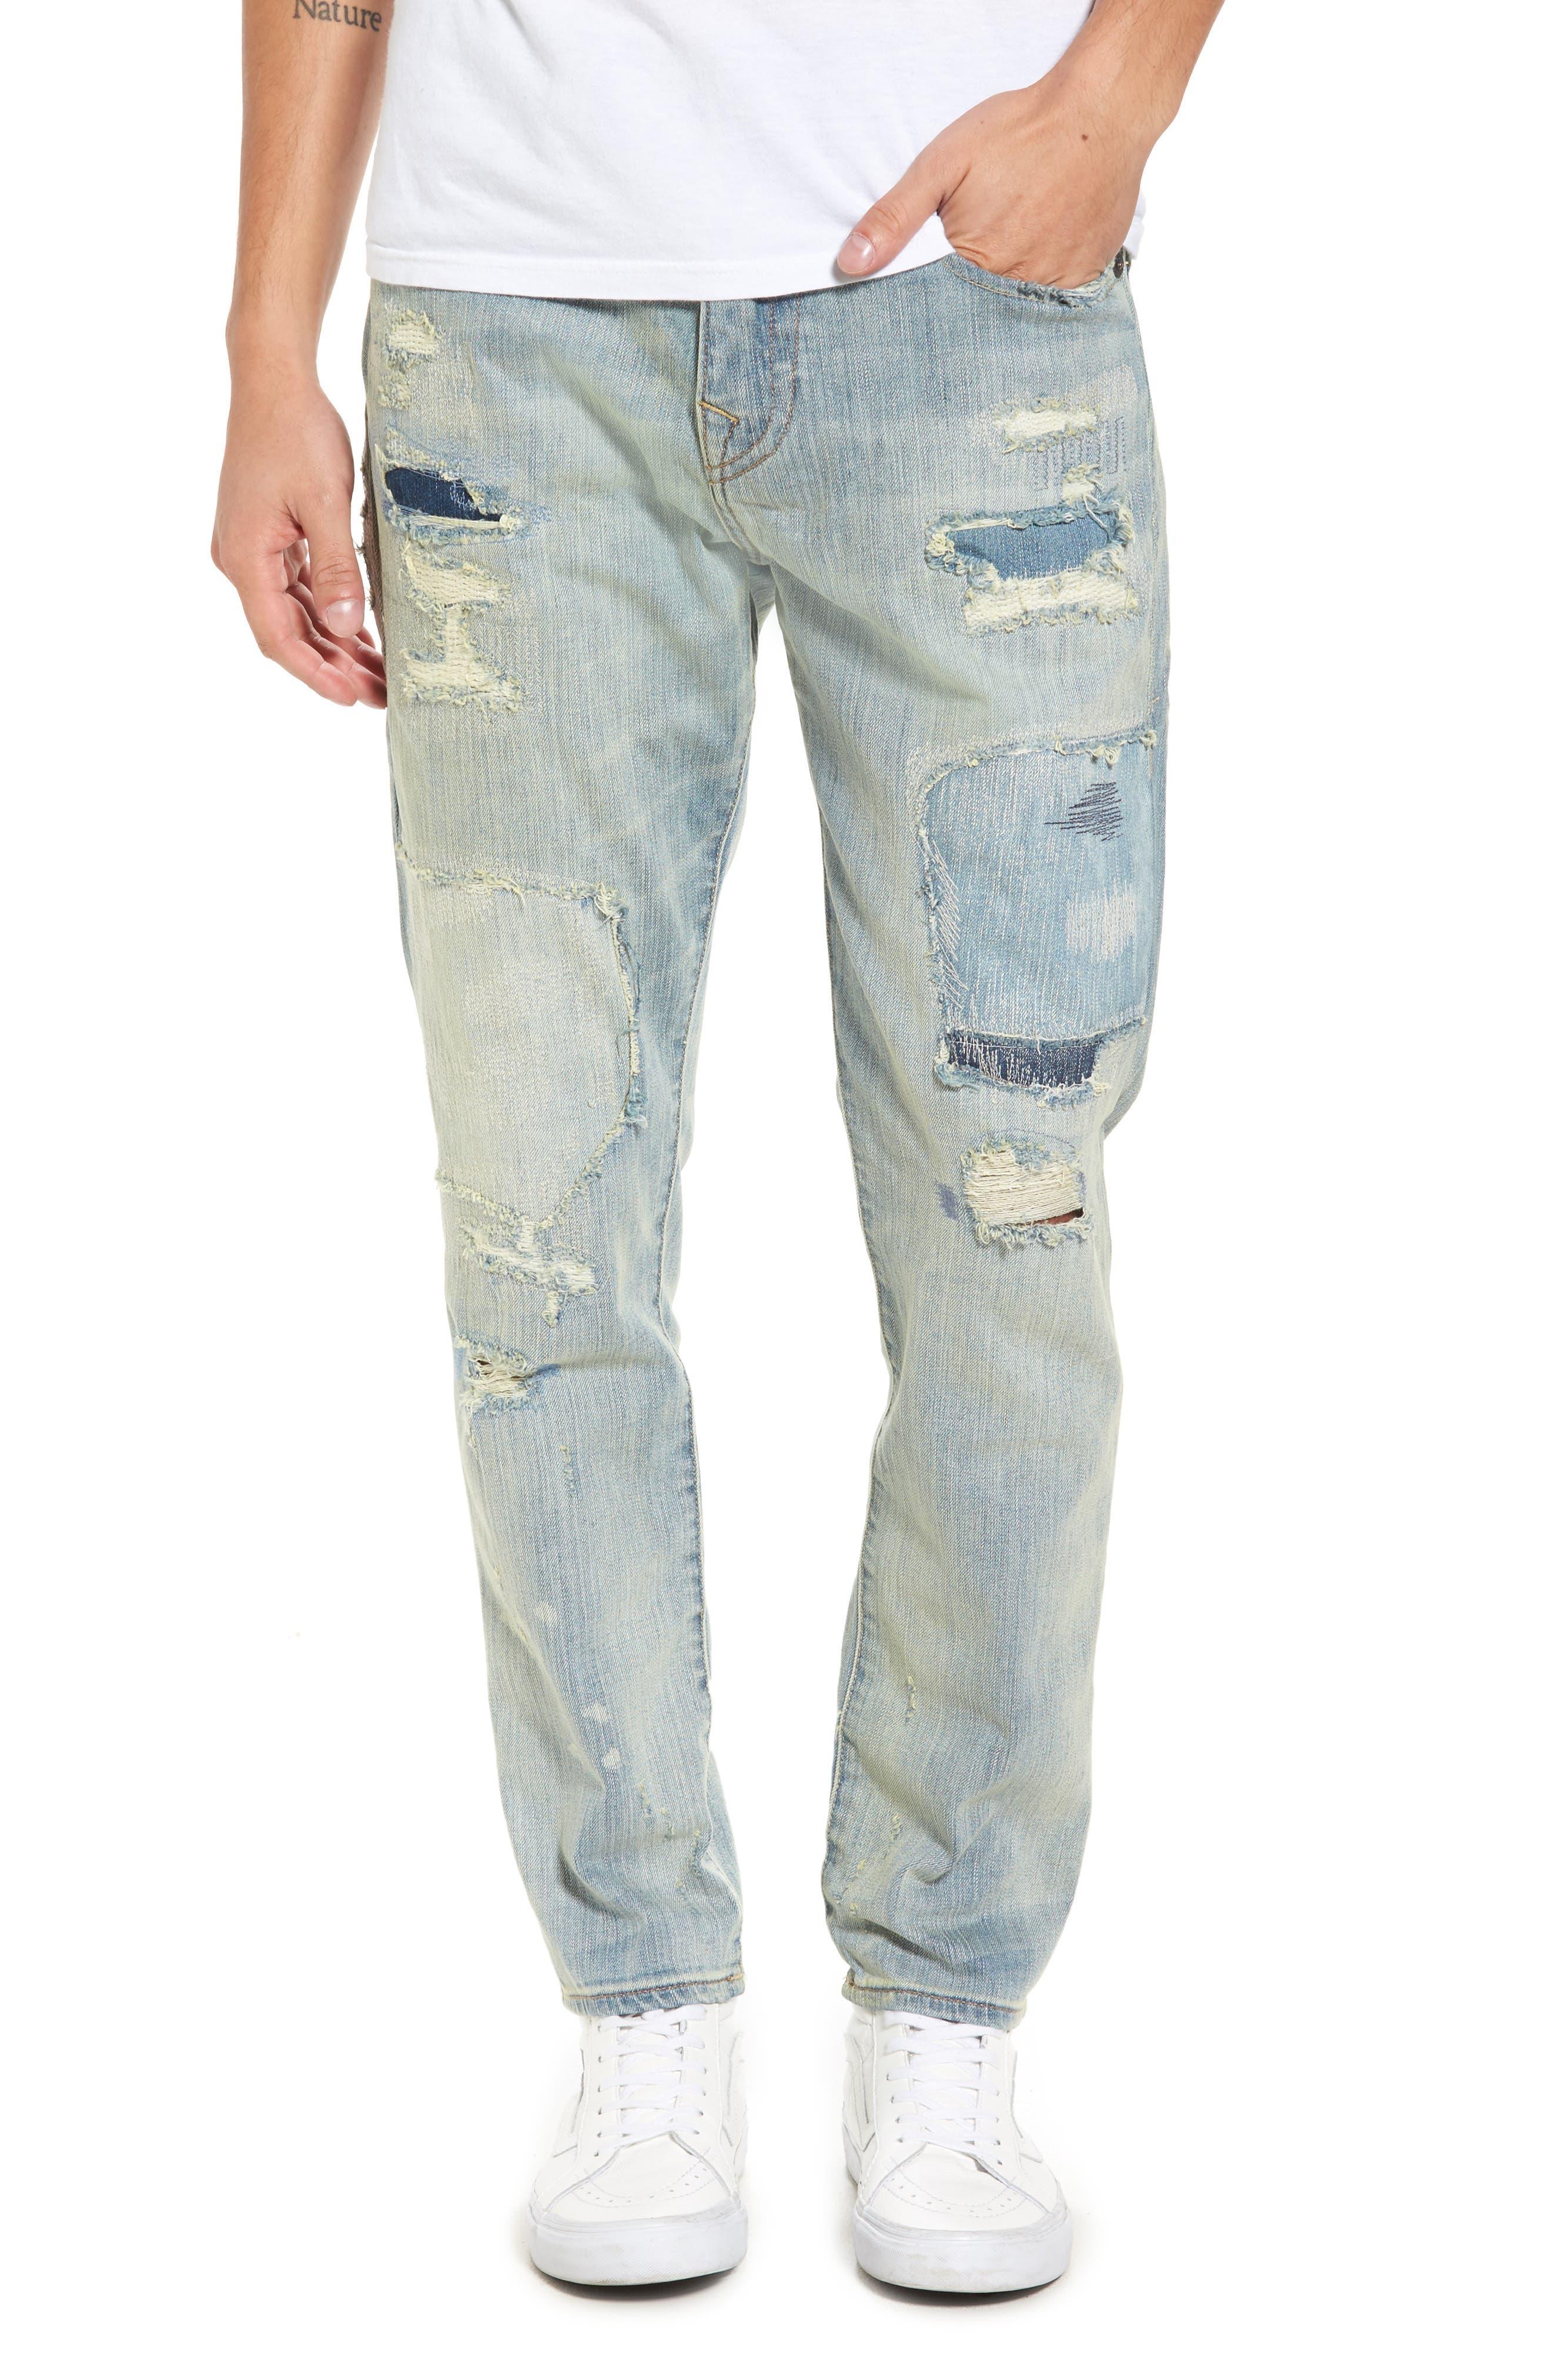 Alternate Image 1 Selected - True Religion Brand Jeans Mick Skinny Fit Jeans (Indigo Immortal)